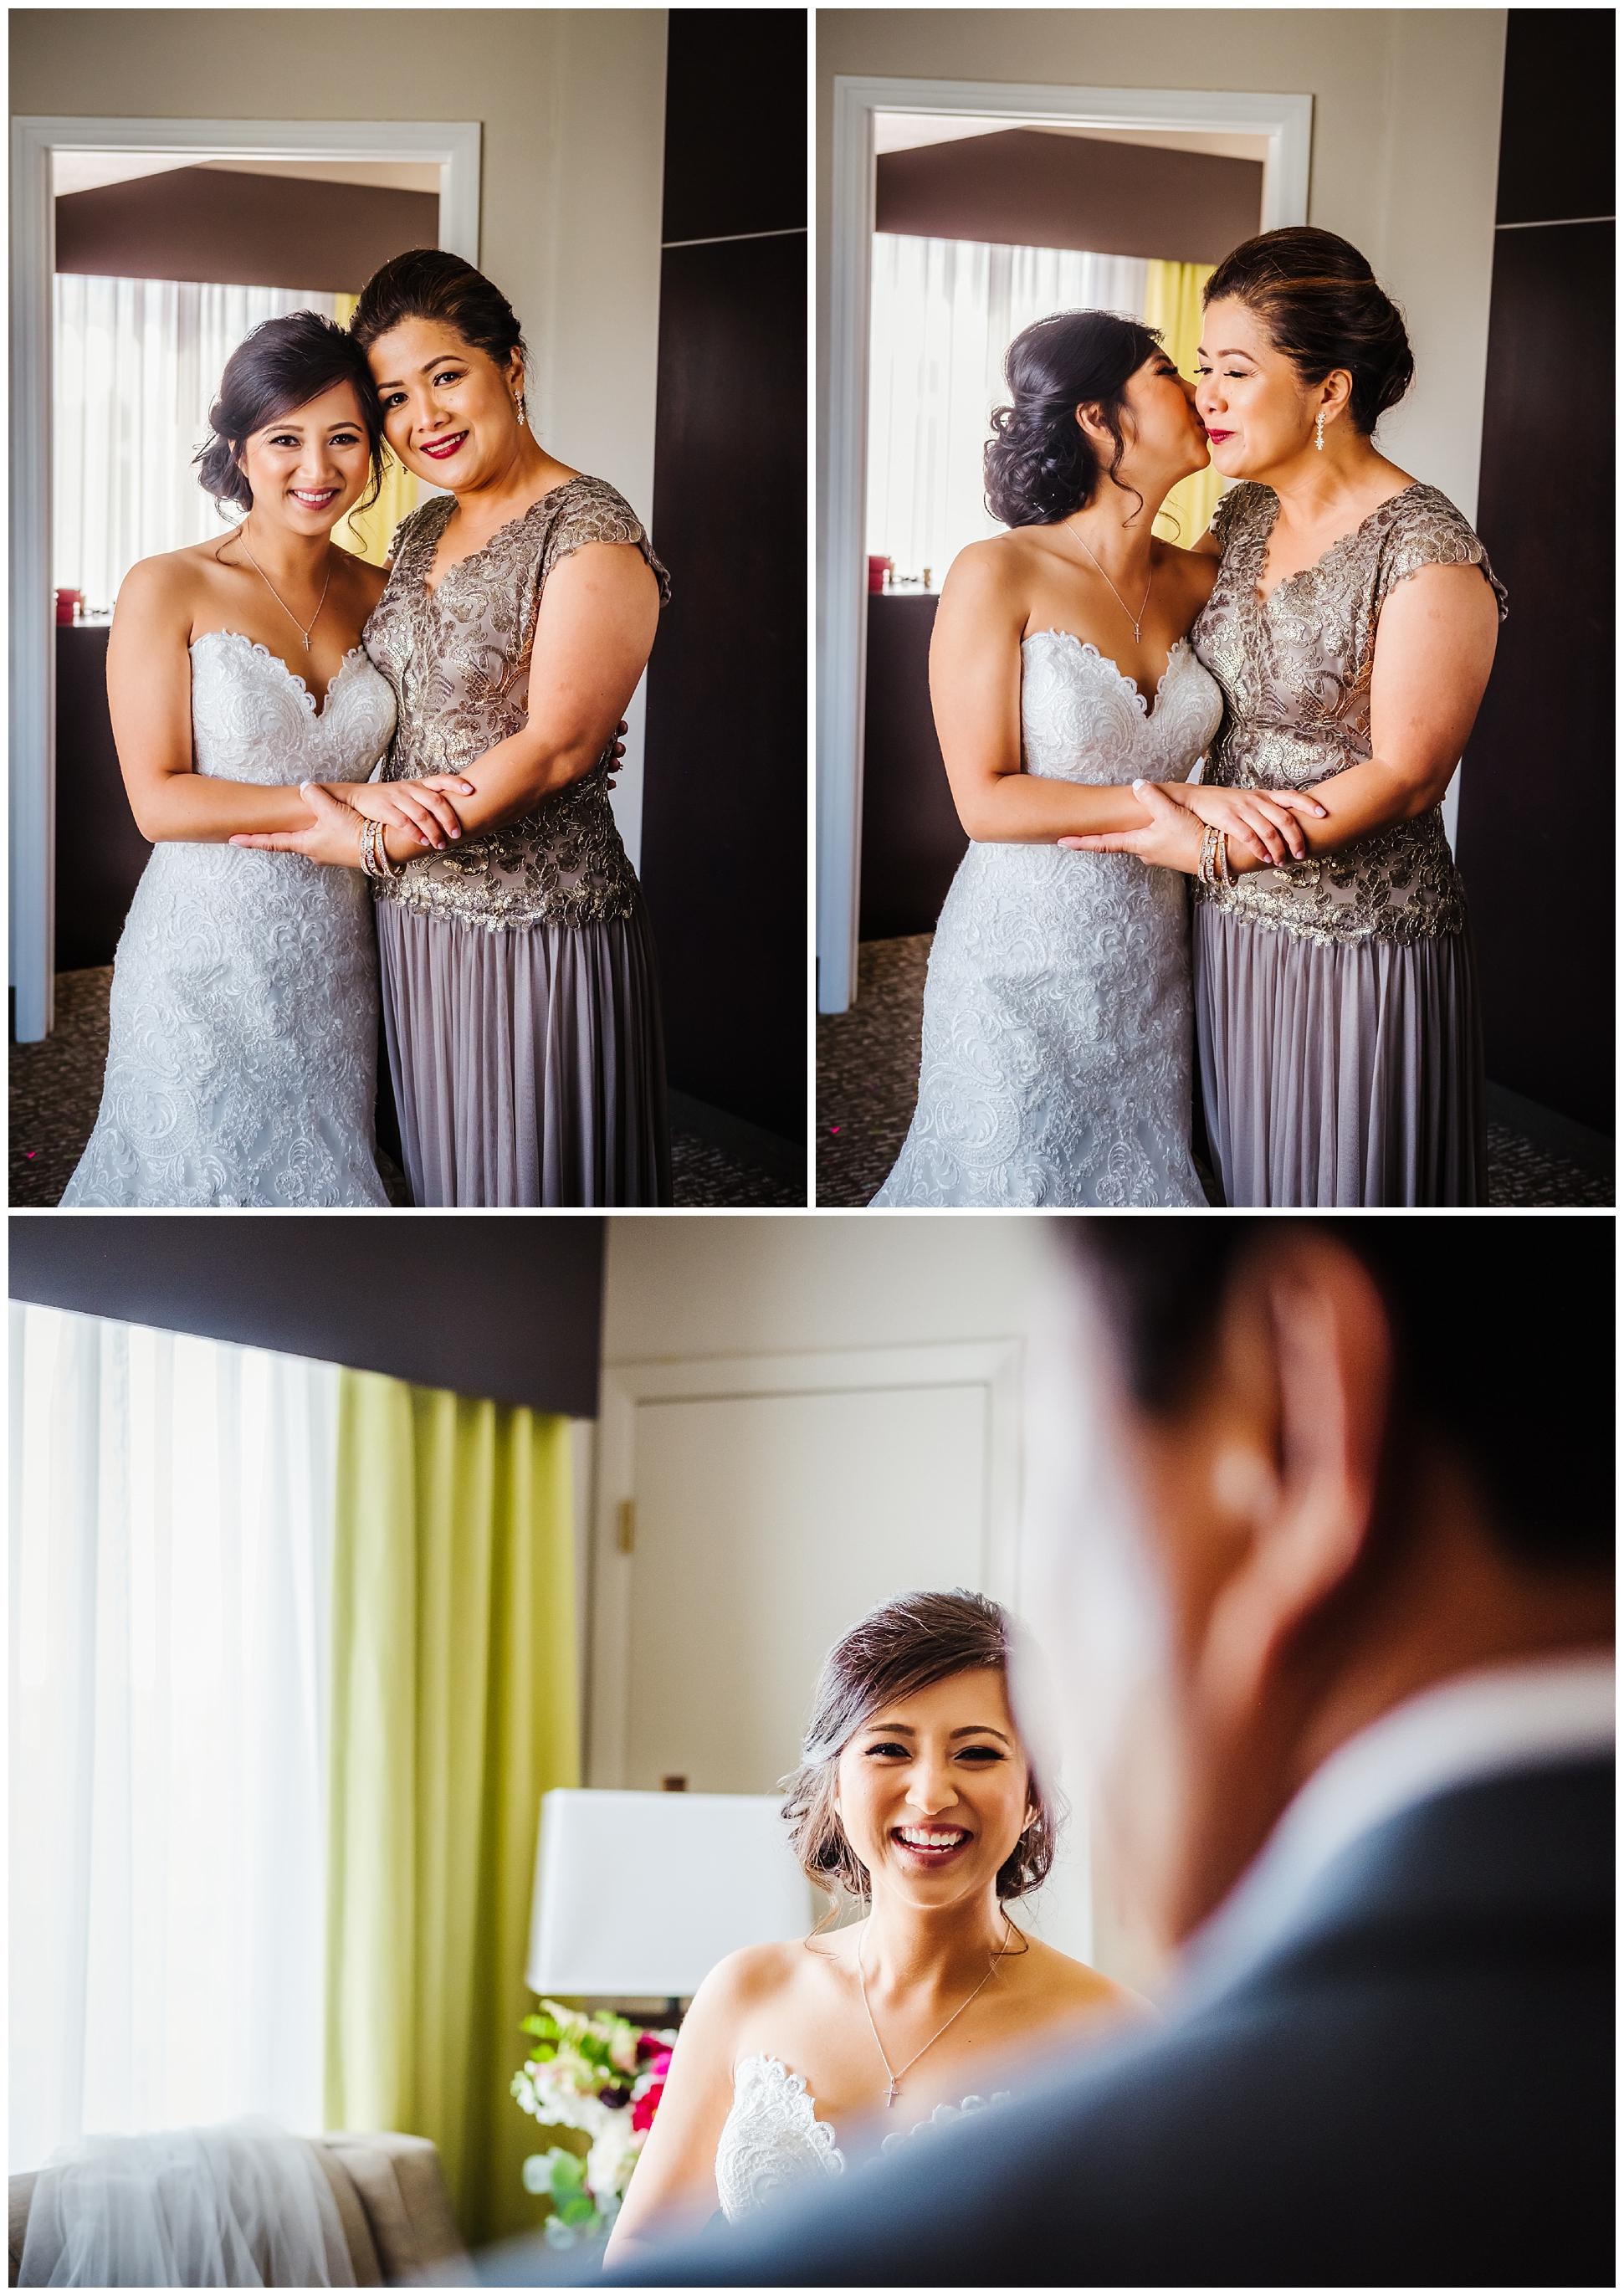 tampa-wedding-photographer-philipino-colorful-woods-ballroom-church-mass-confetti-fuscia_0012.jpg